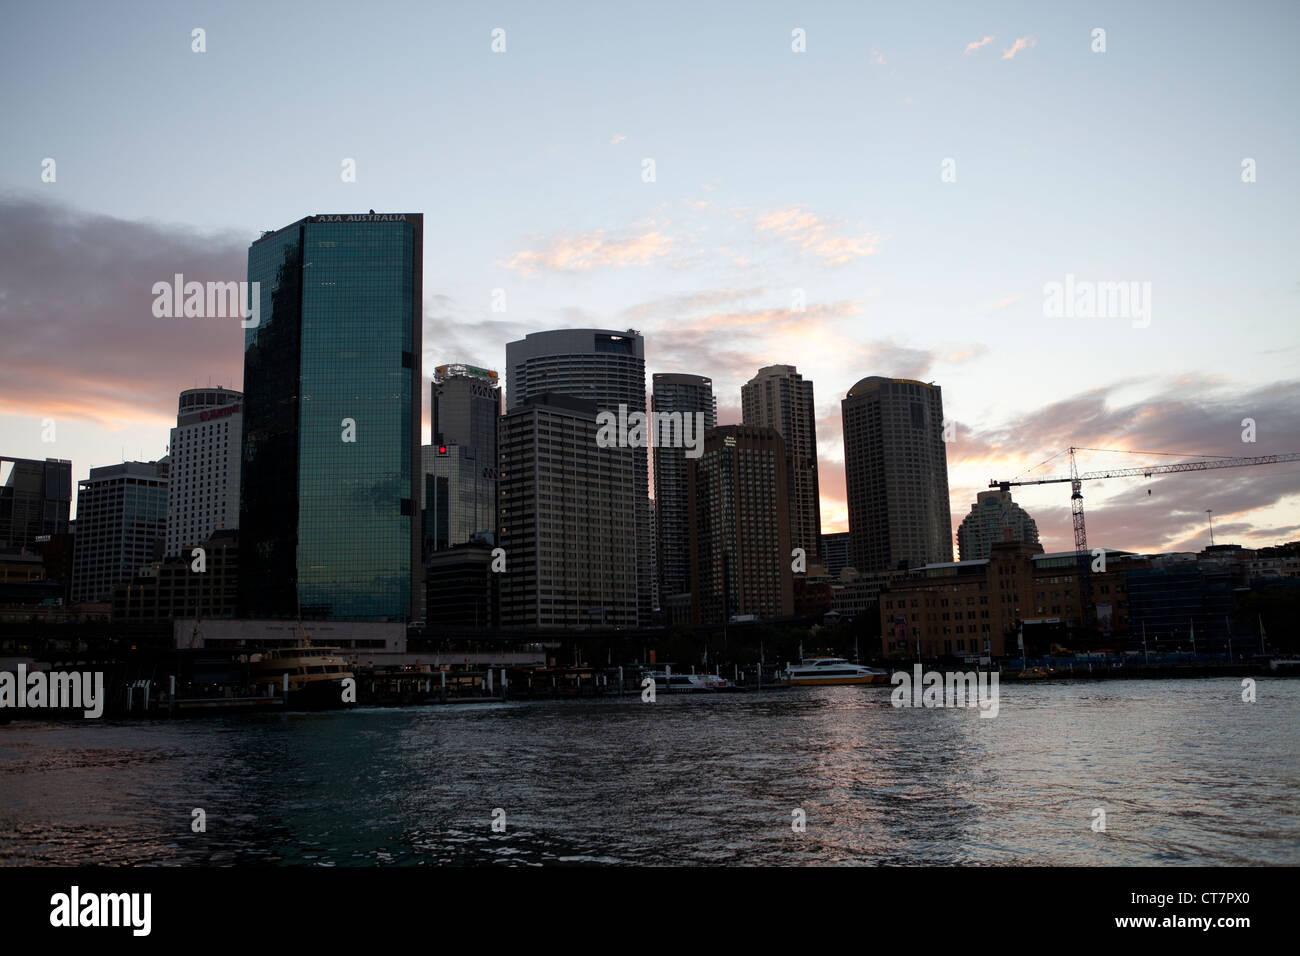 Promenade at Circular Quay, Sydney, Australia - Stock Image